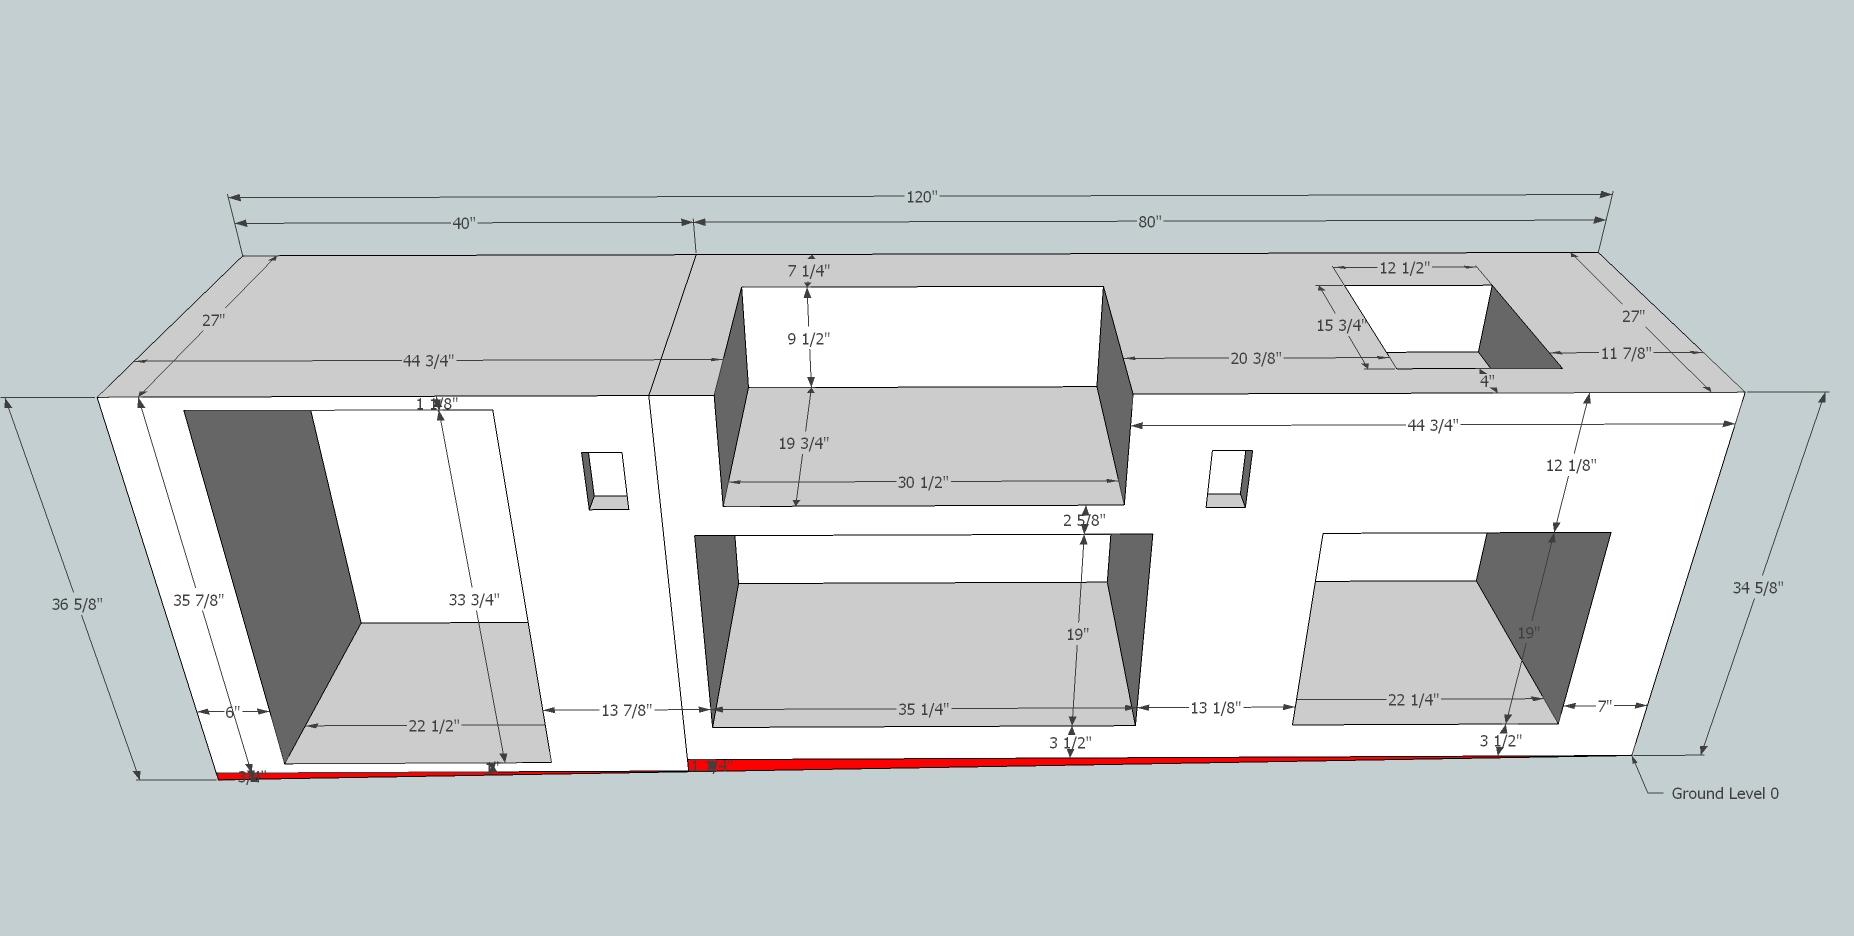 Philp Camfield Revised 2 Design Specs1.jpg